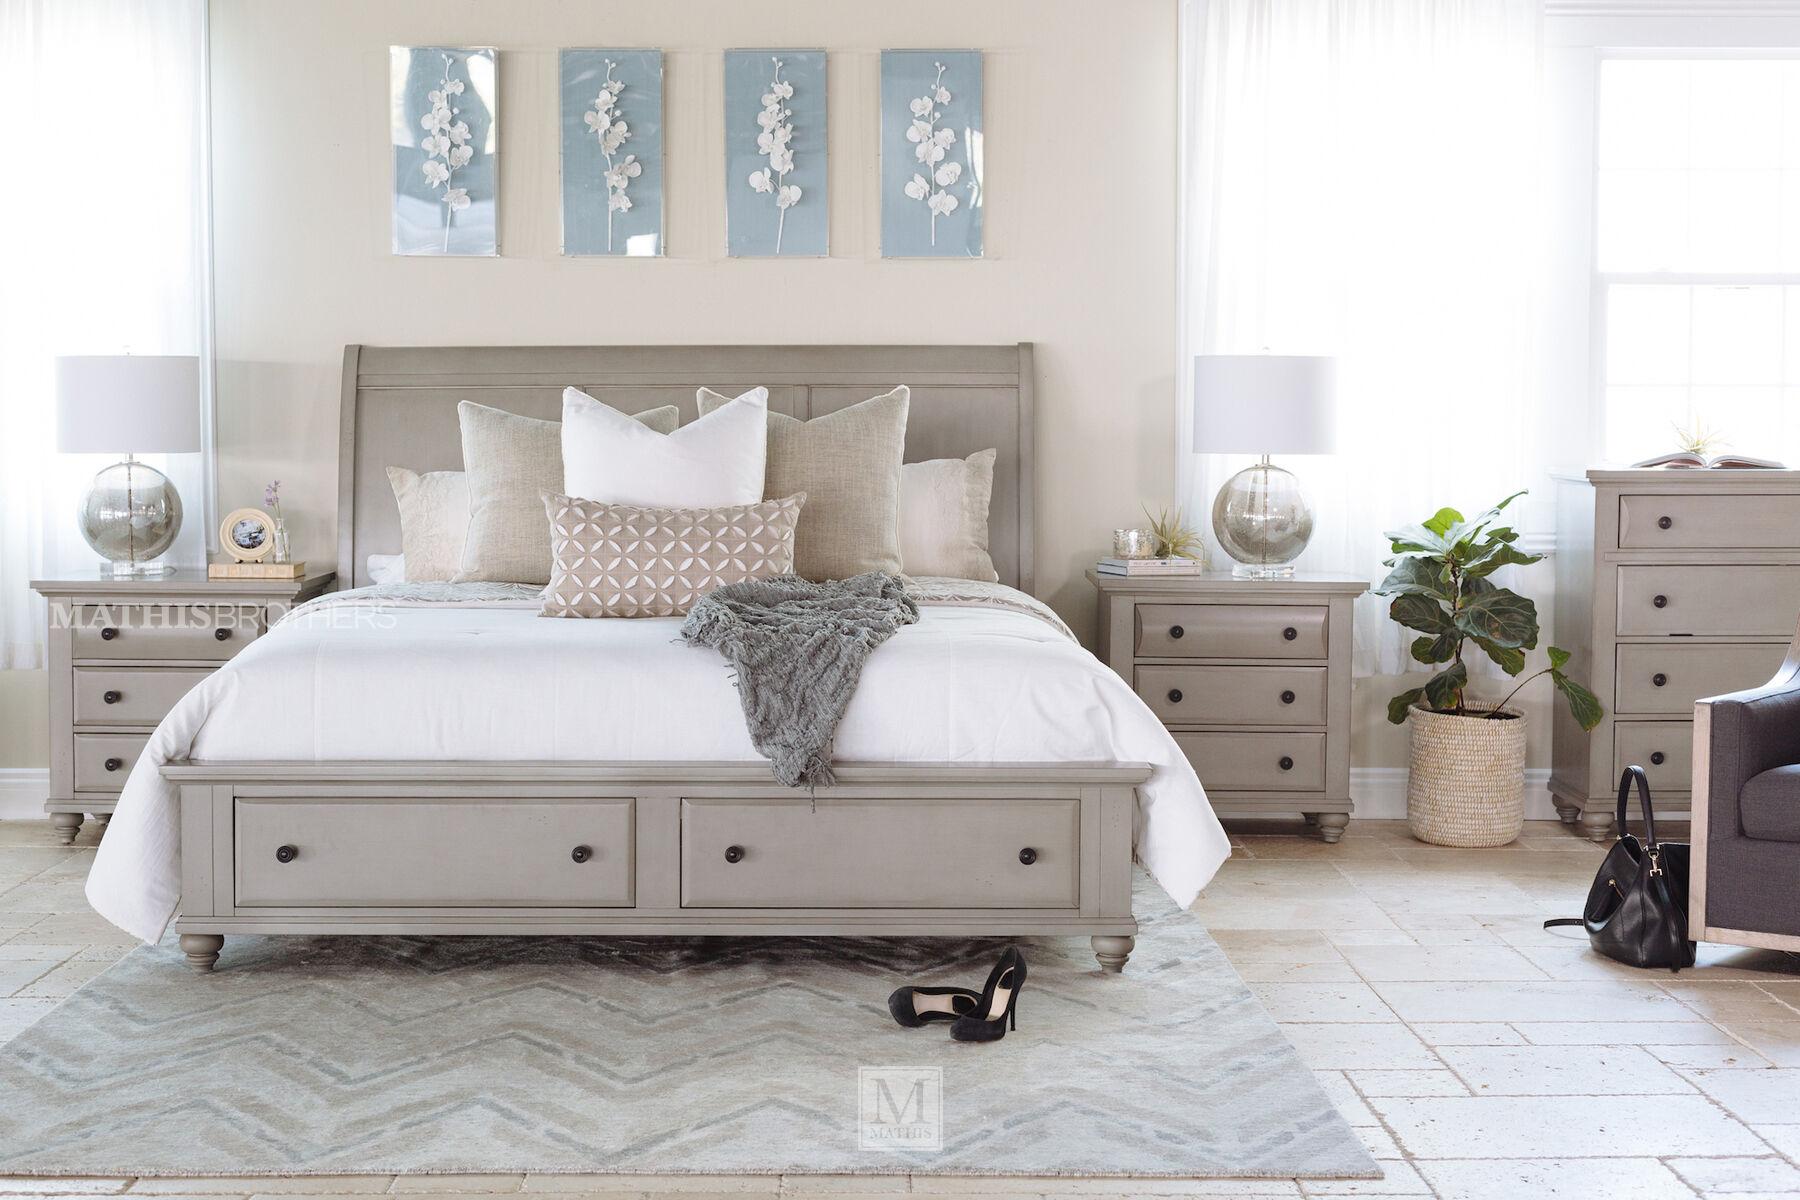 Beds - Storage Beds - Wood & Metal Beds